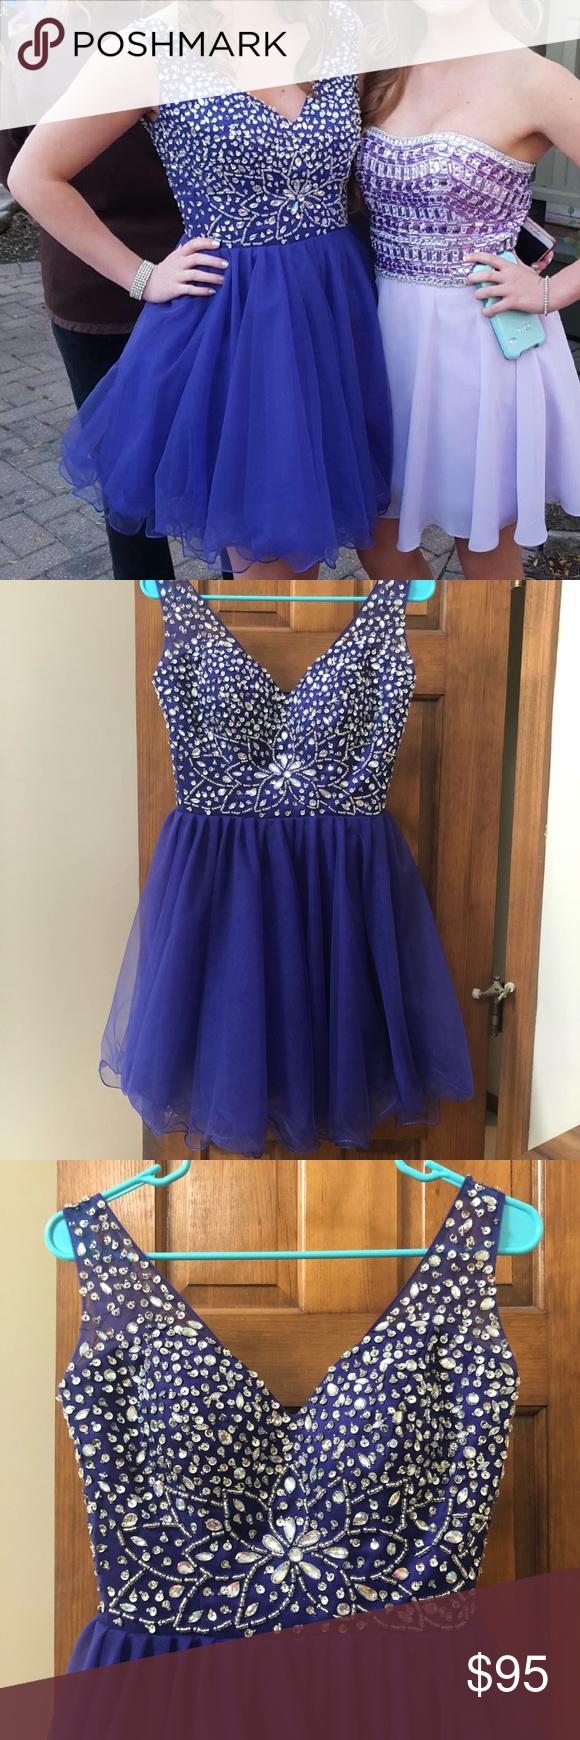 Homecoming prom dress beaded dark purple silver my posh picks